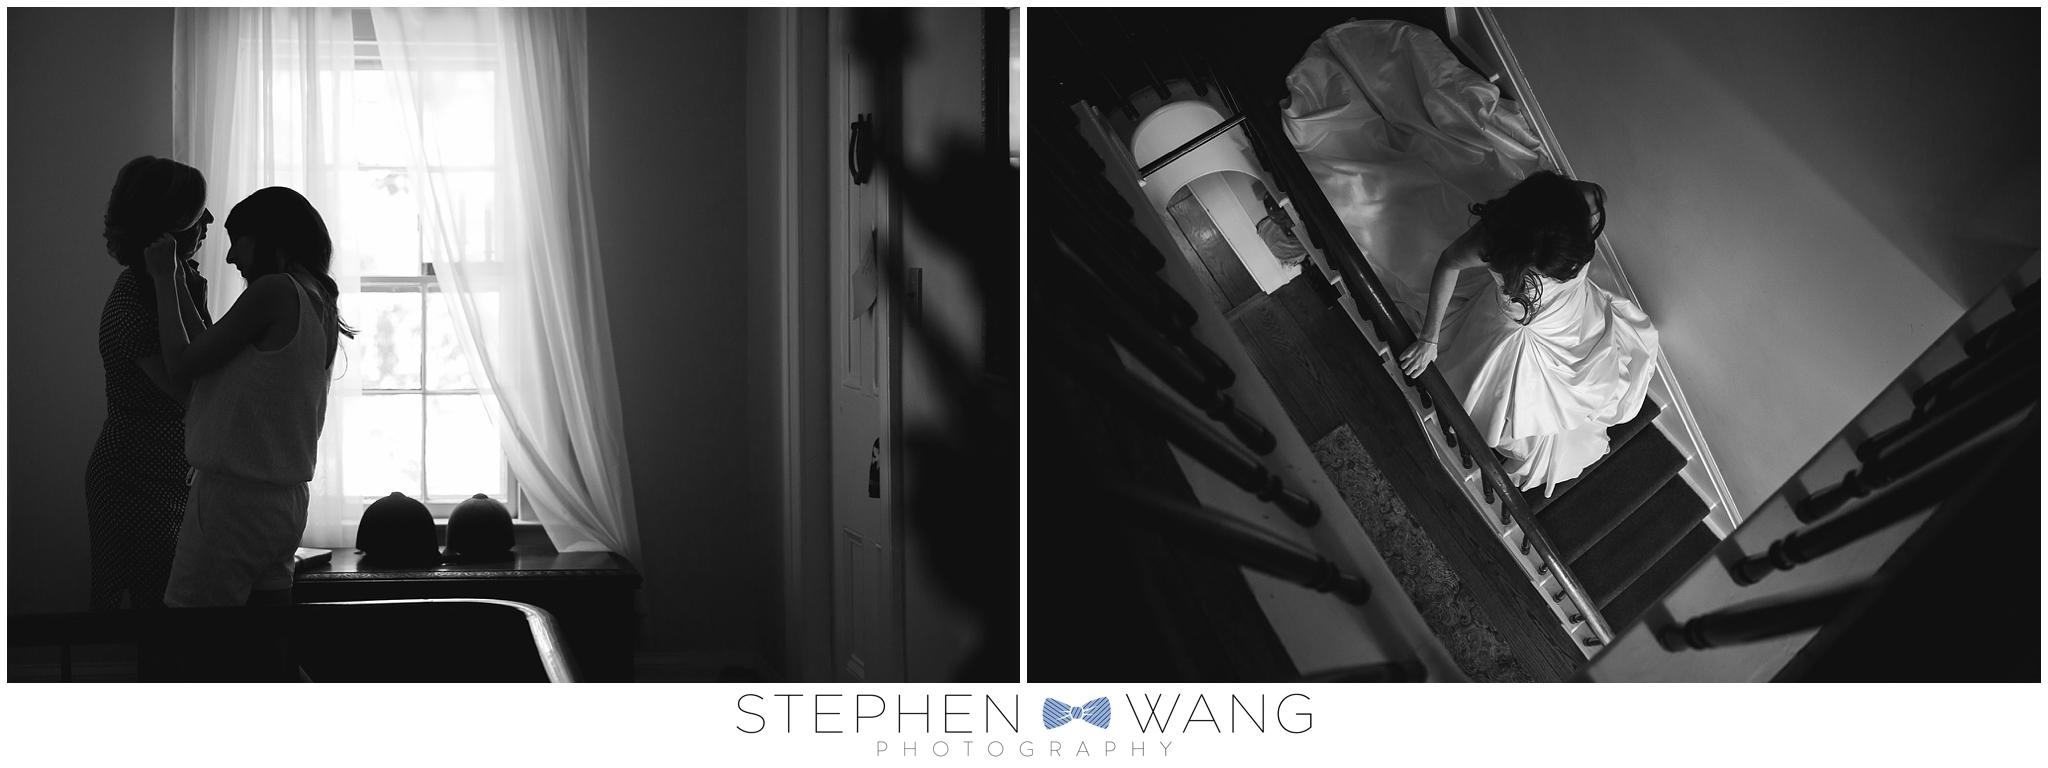 Stephen Wang Photography Wedding Photographer Connecticut CT-12-24_0005.jpg